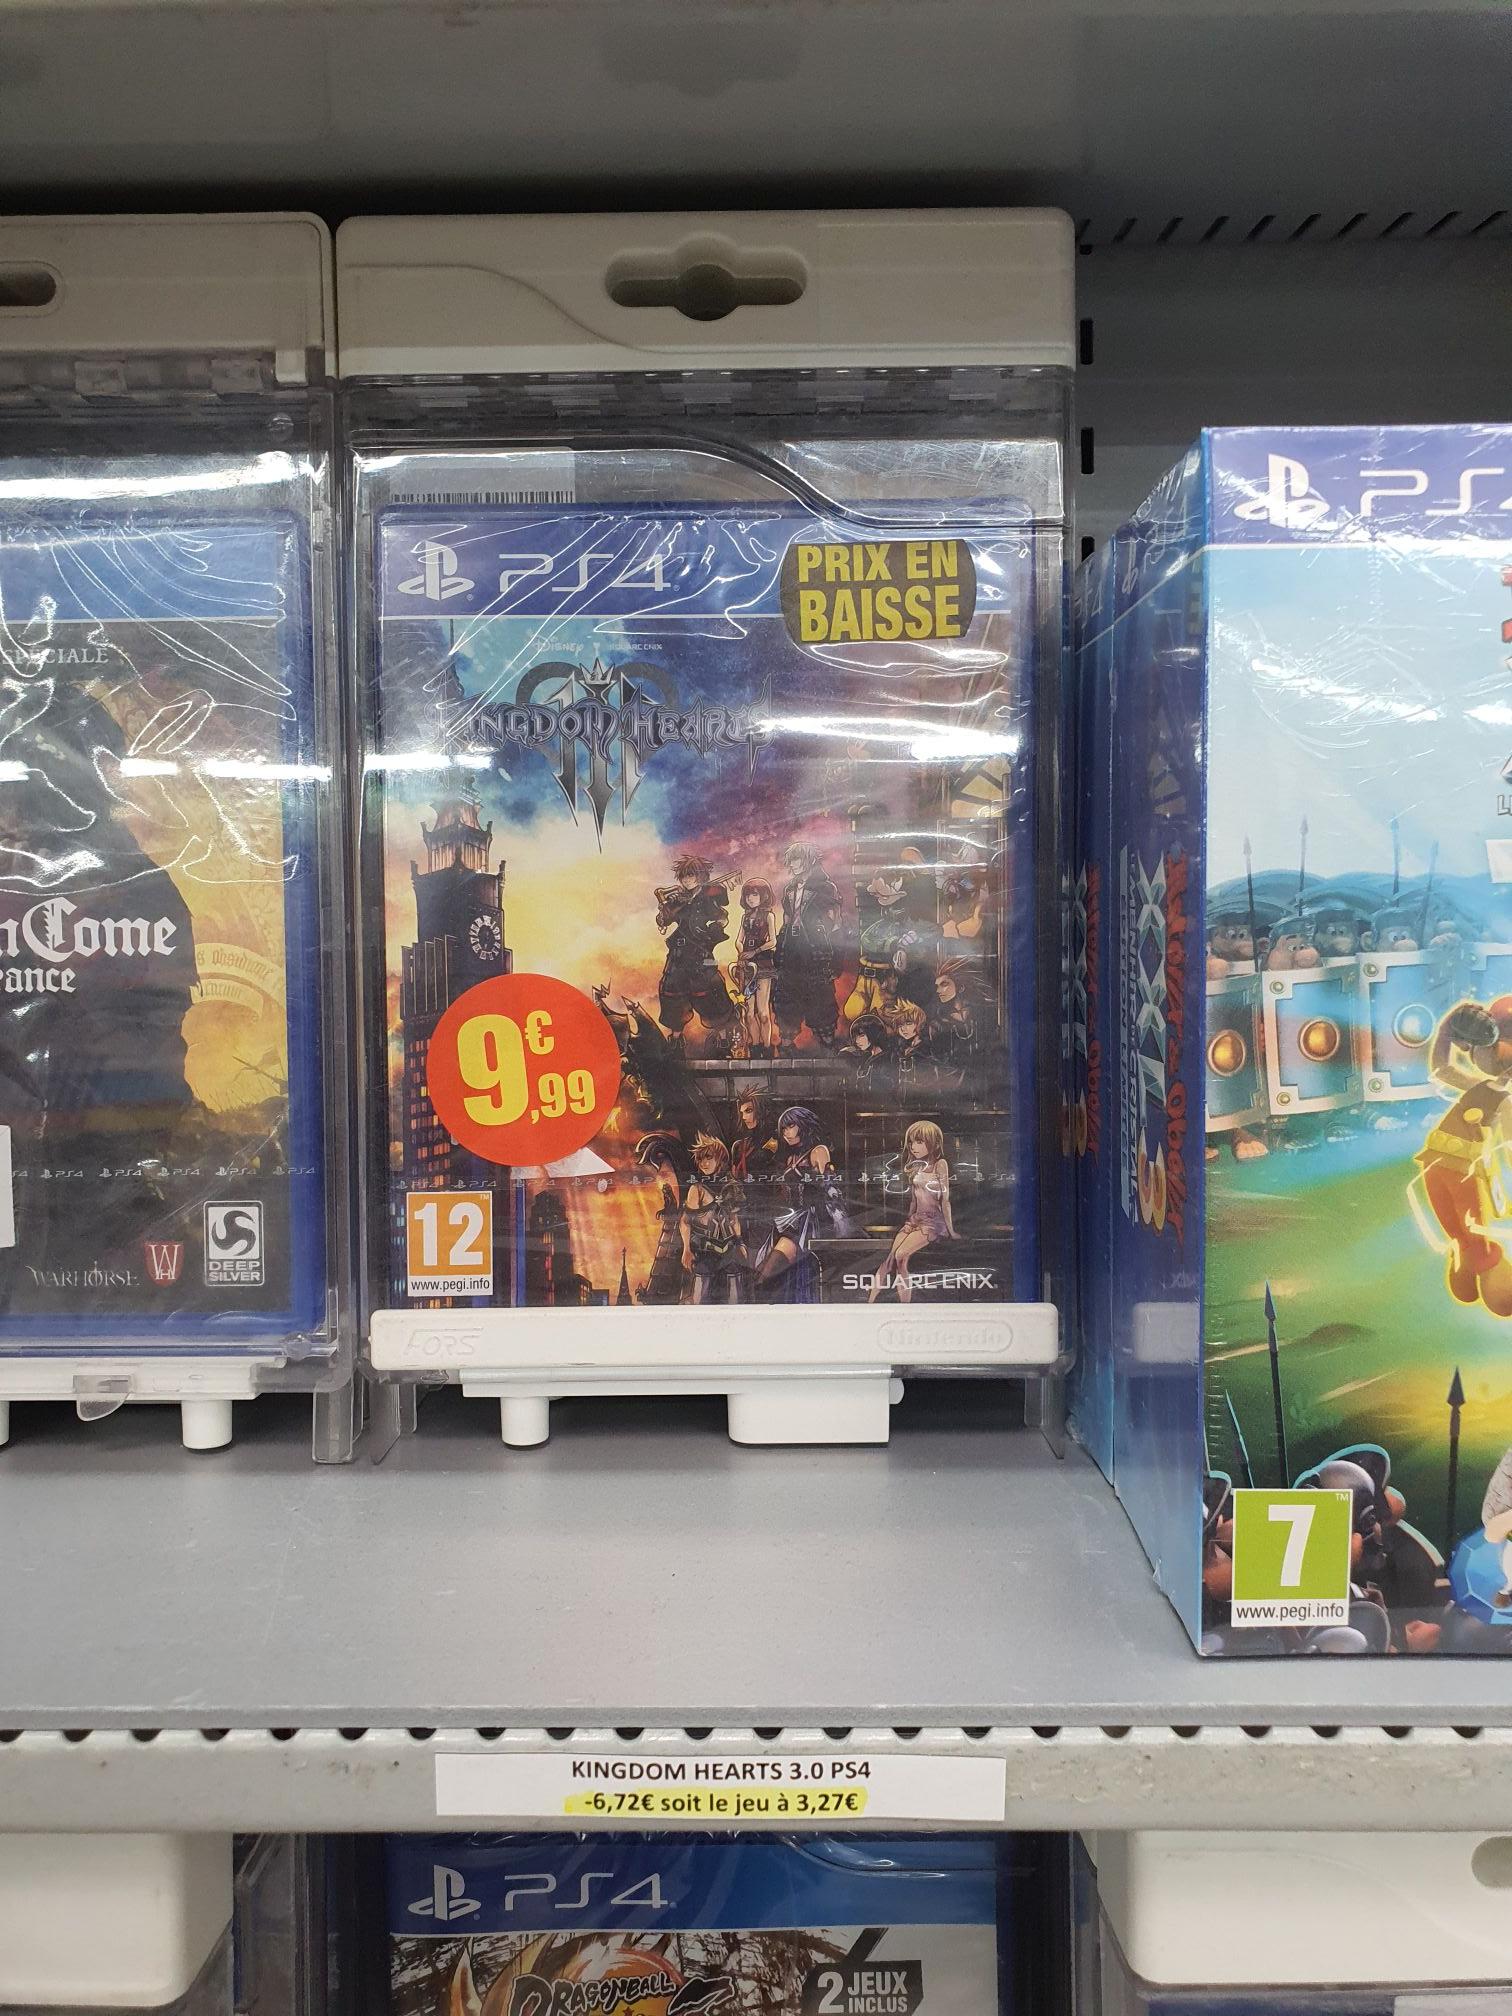 Kingdom Hearts 3 sur PS4 - Bollene (84)